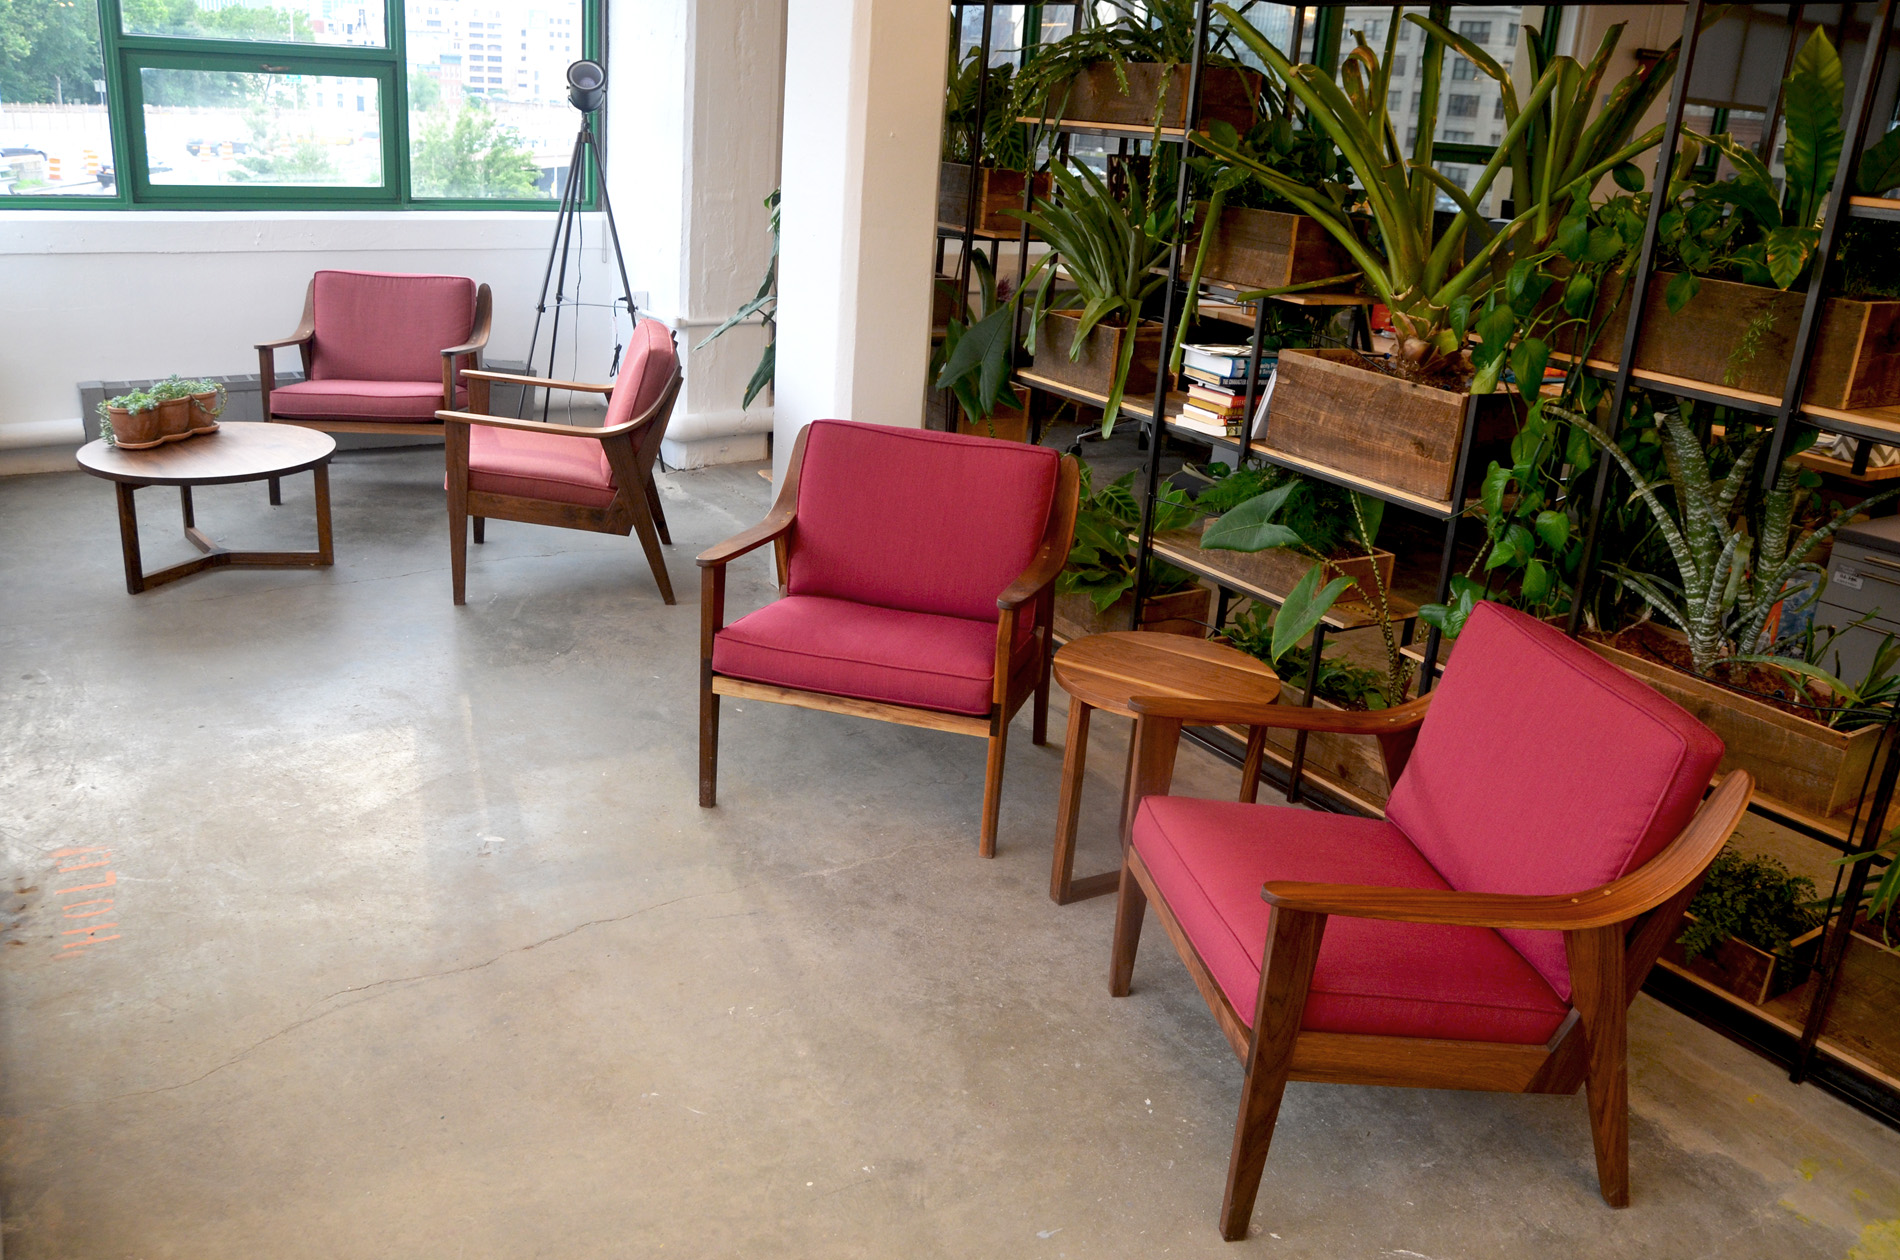 chairs_plants1.jpg